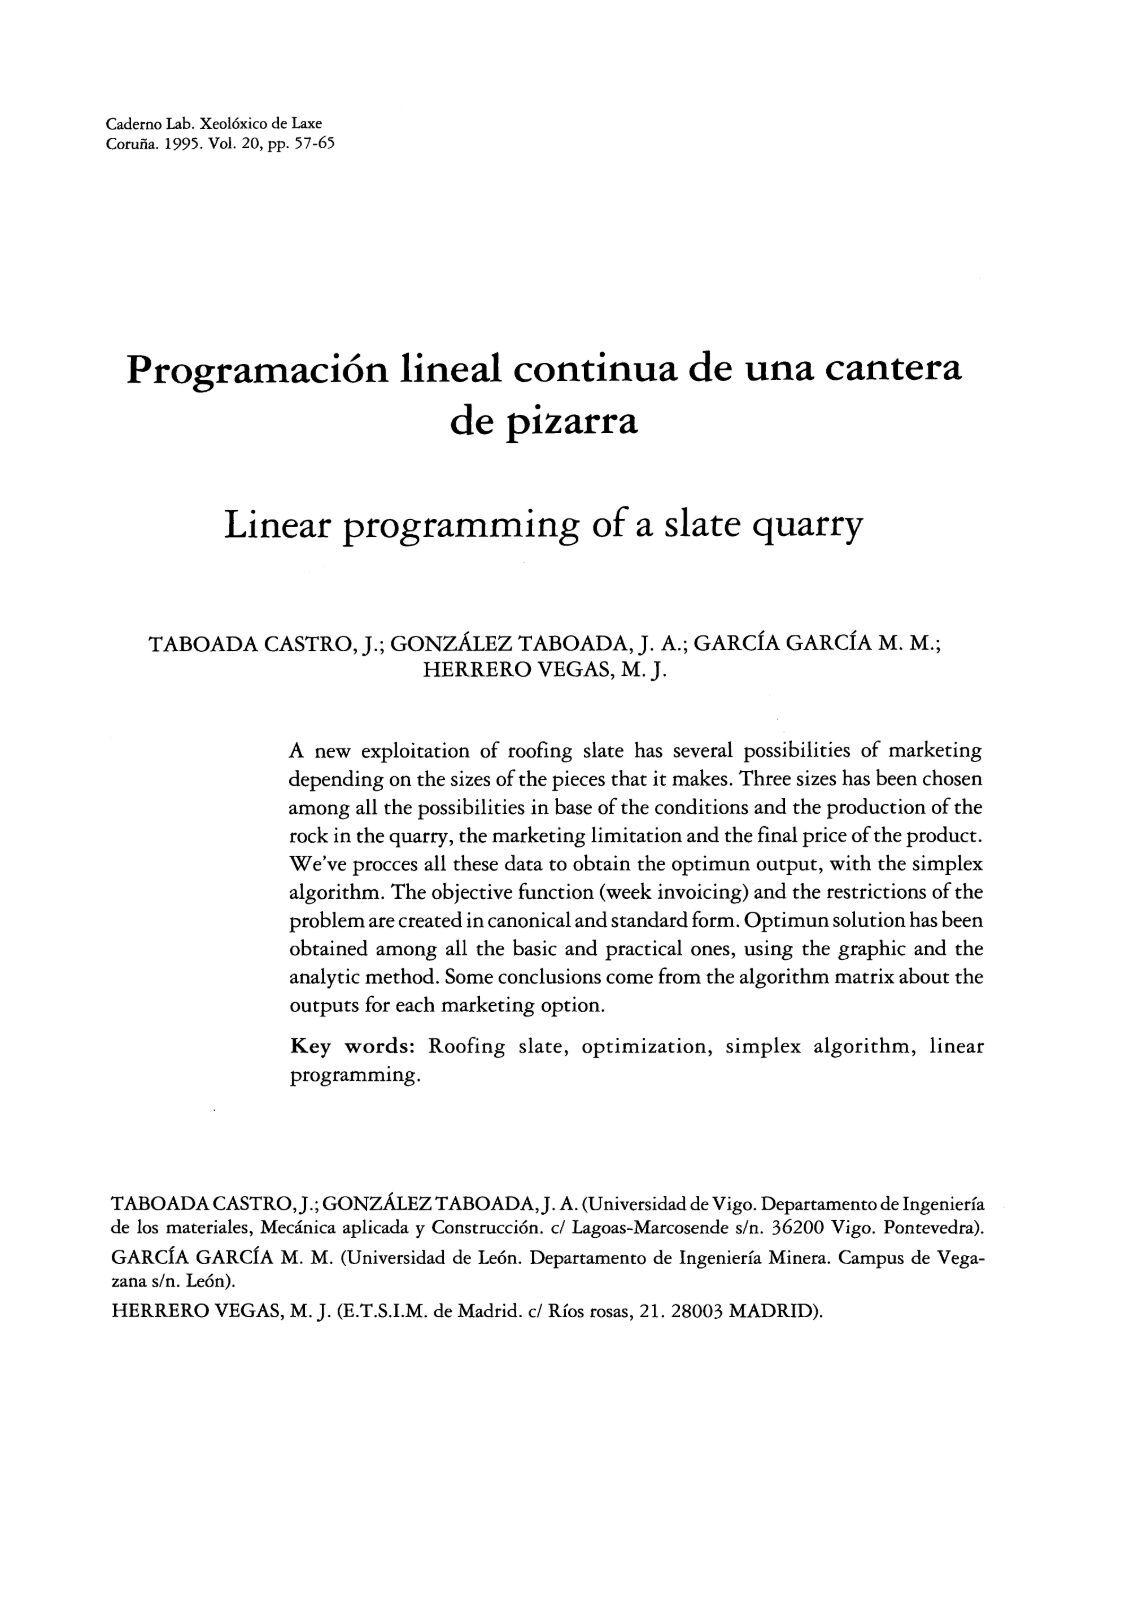 280 free magazines from ruc udc es - Cantera de pizarra ...